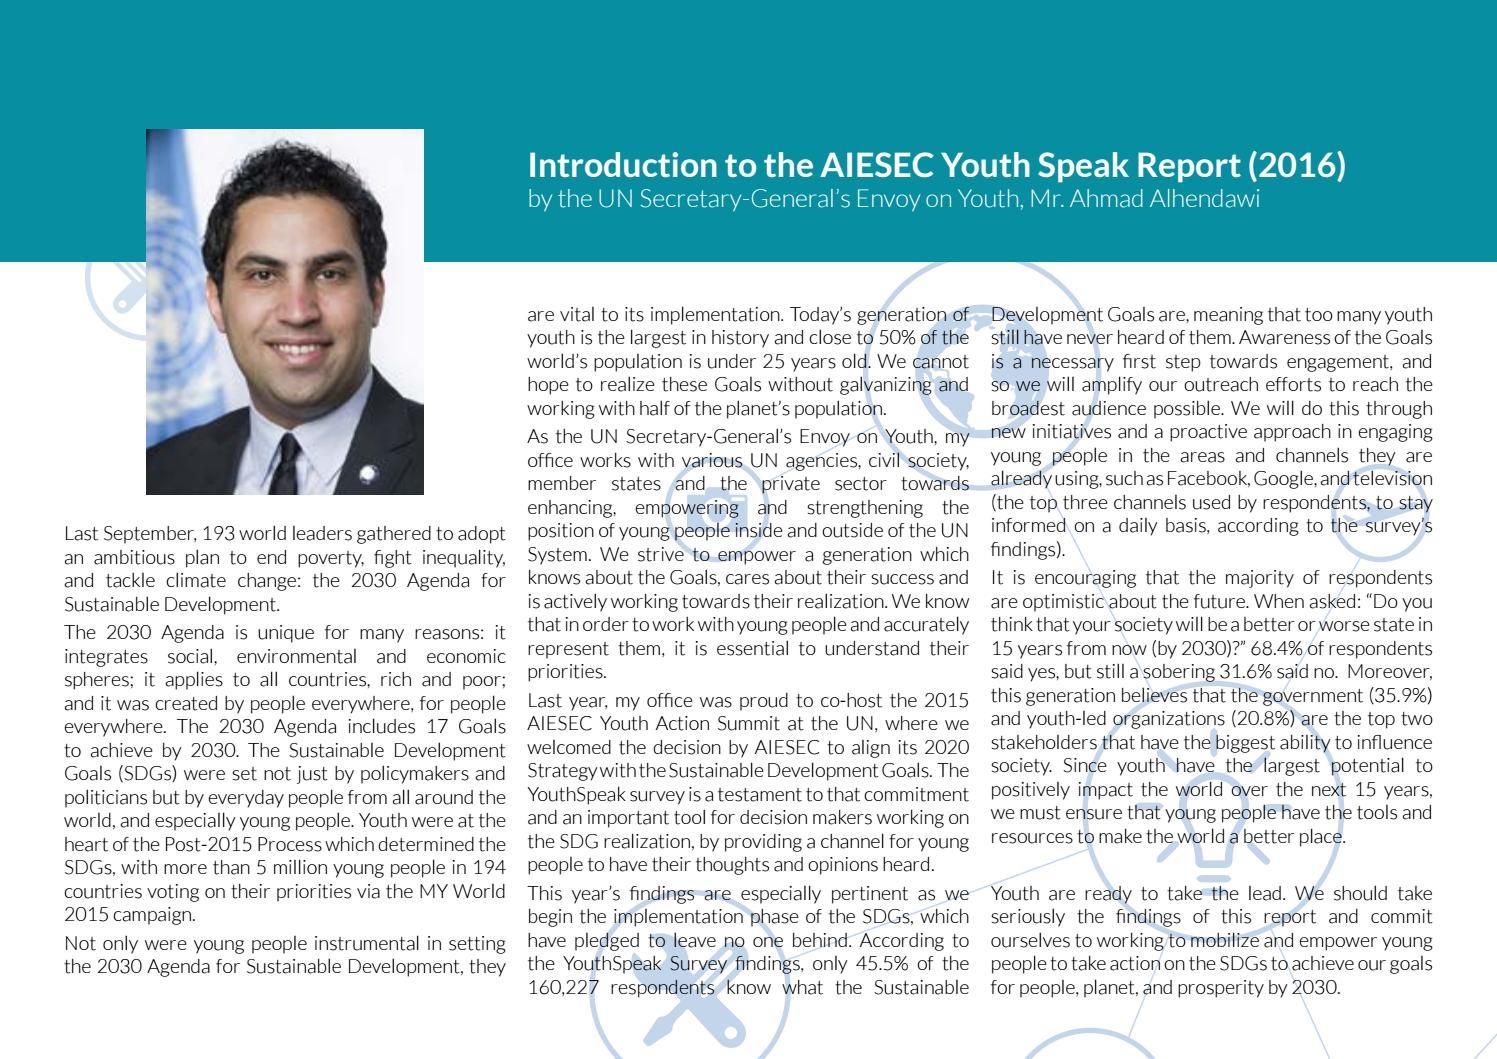 Ahmad Alhendawi youthspeak global report 2016aiesec international - issuu